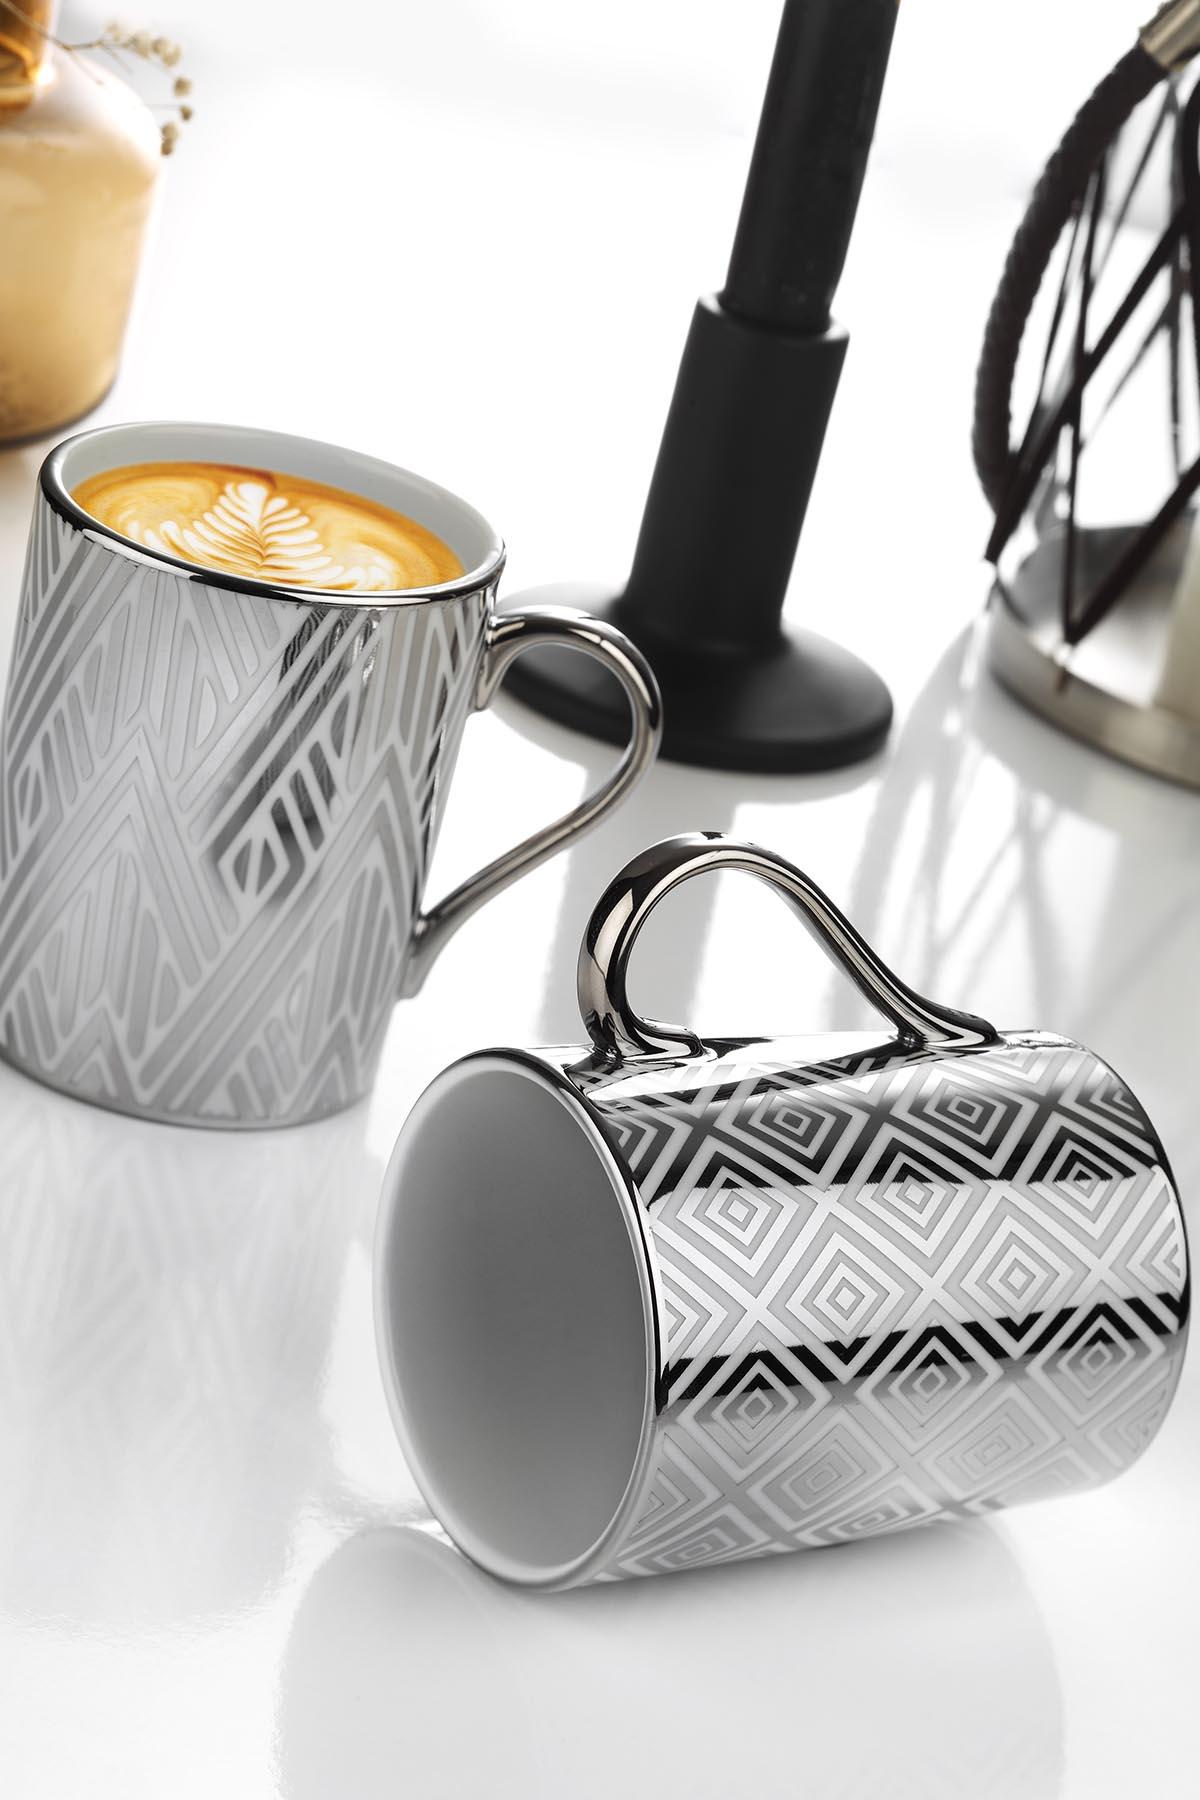 Kütahya Porselen - Kütahya Porselen Forest 2′li Mug Bardak Platin 10932